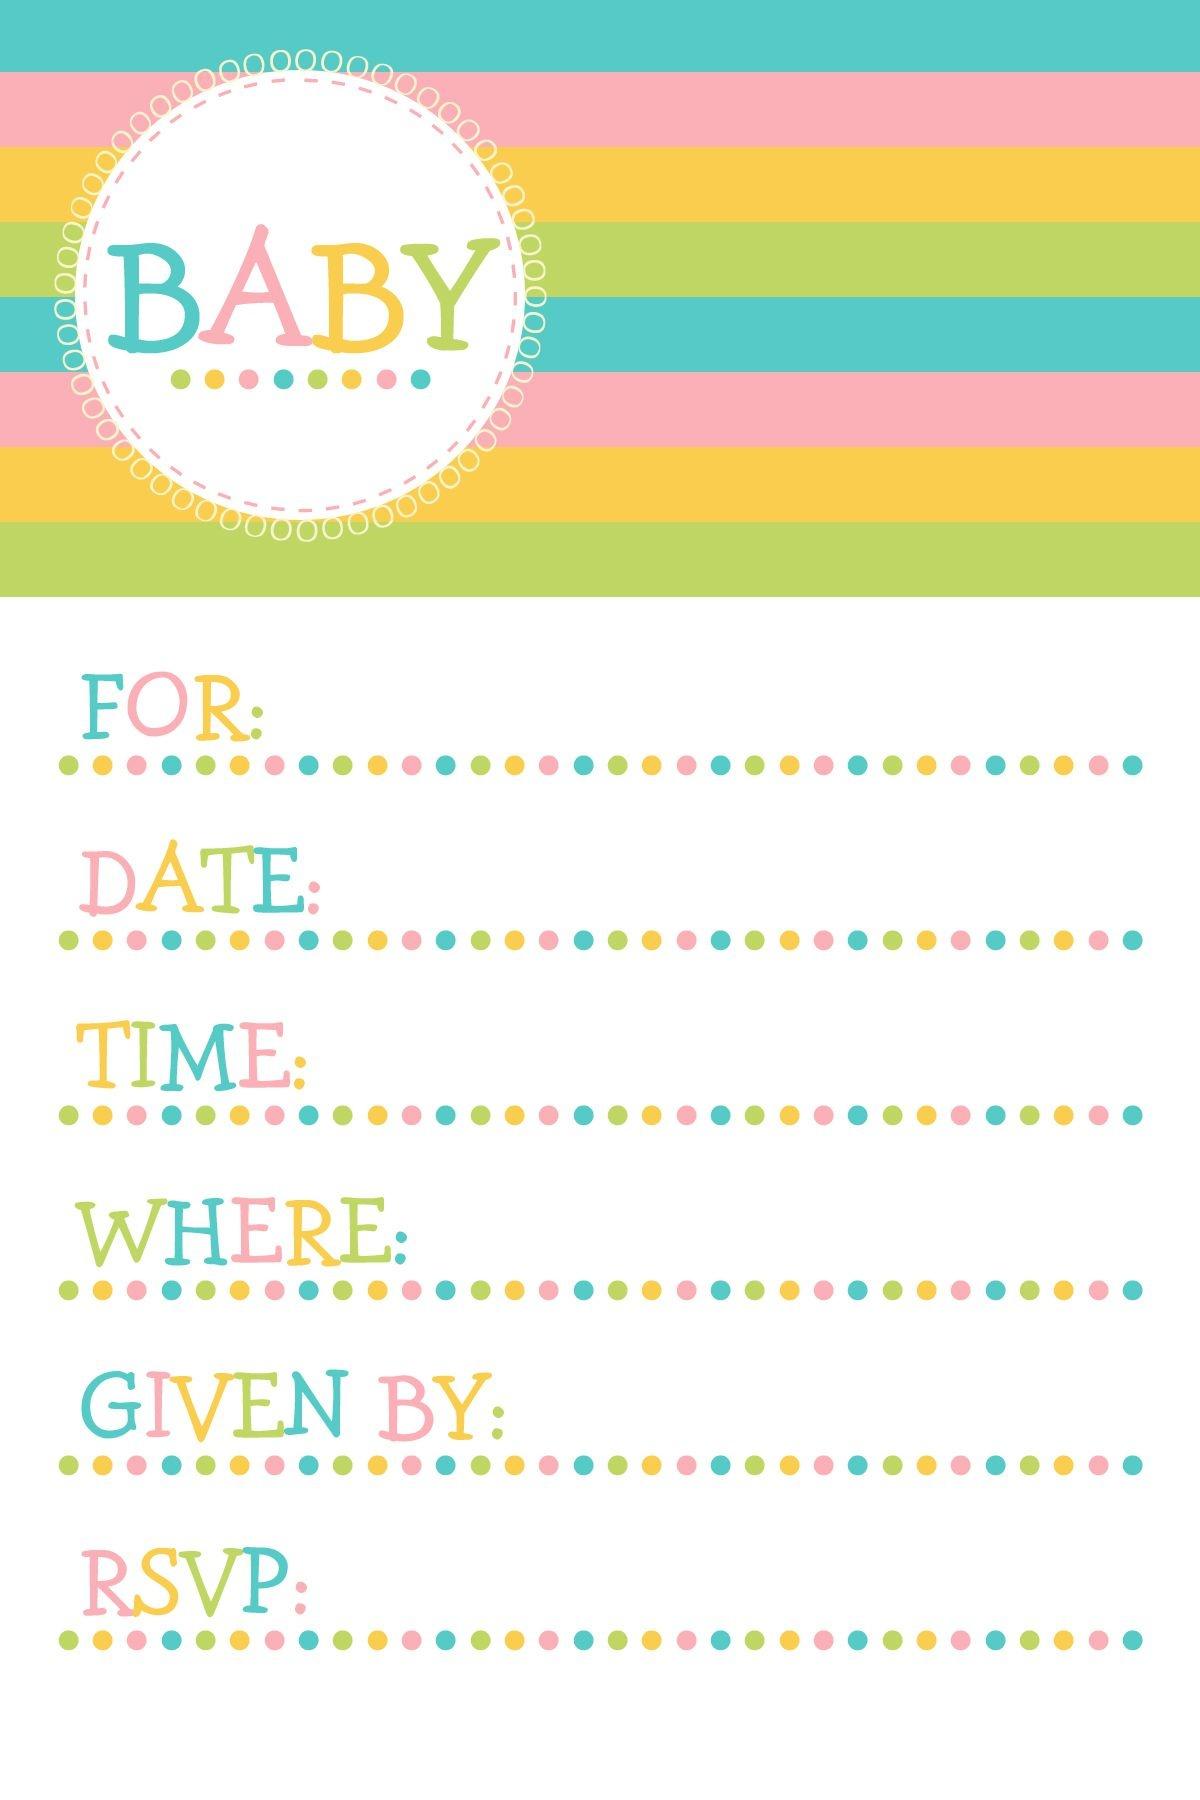 25 Adorable Free Printable Baby Shower Invitations - Free Printable Baby Shower Invitation Maker